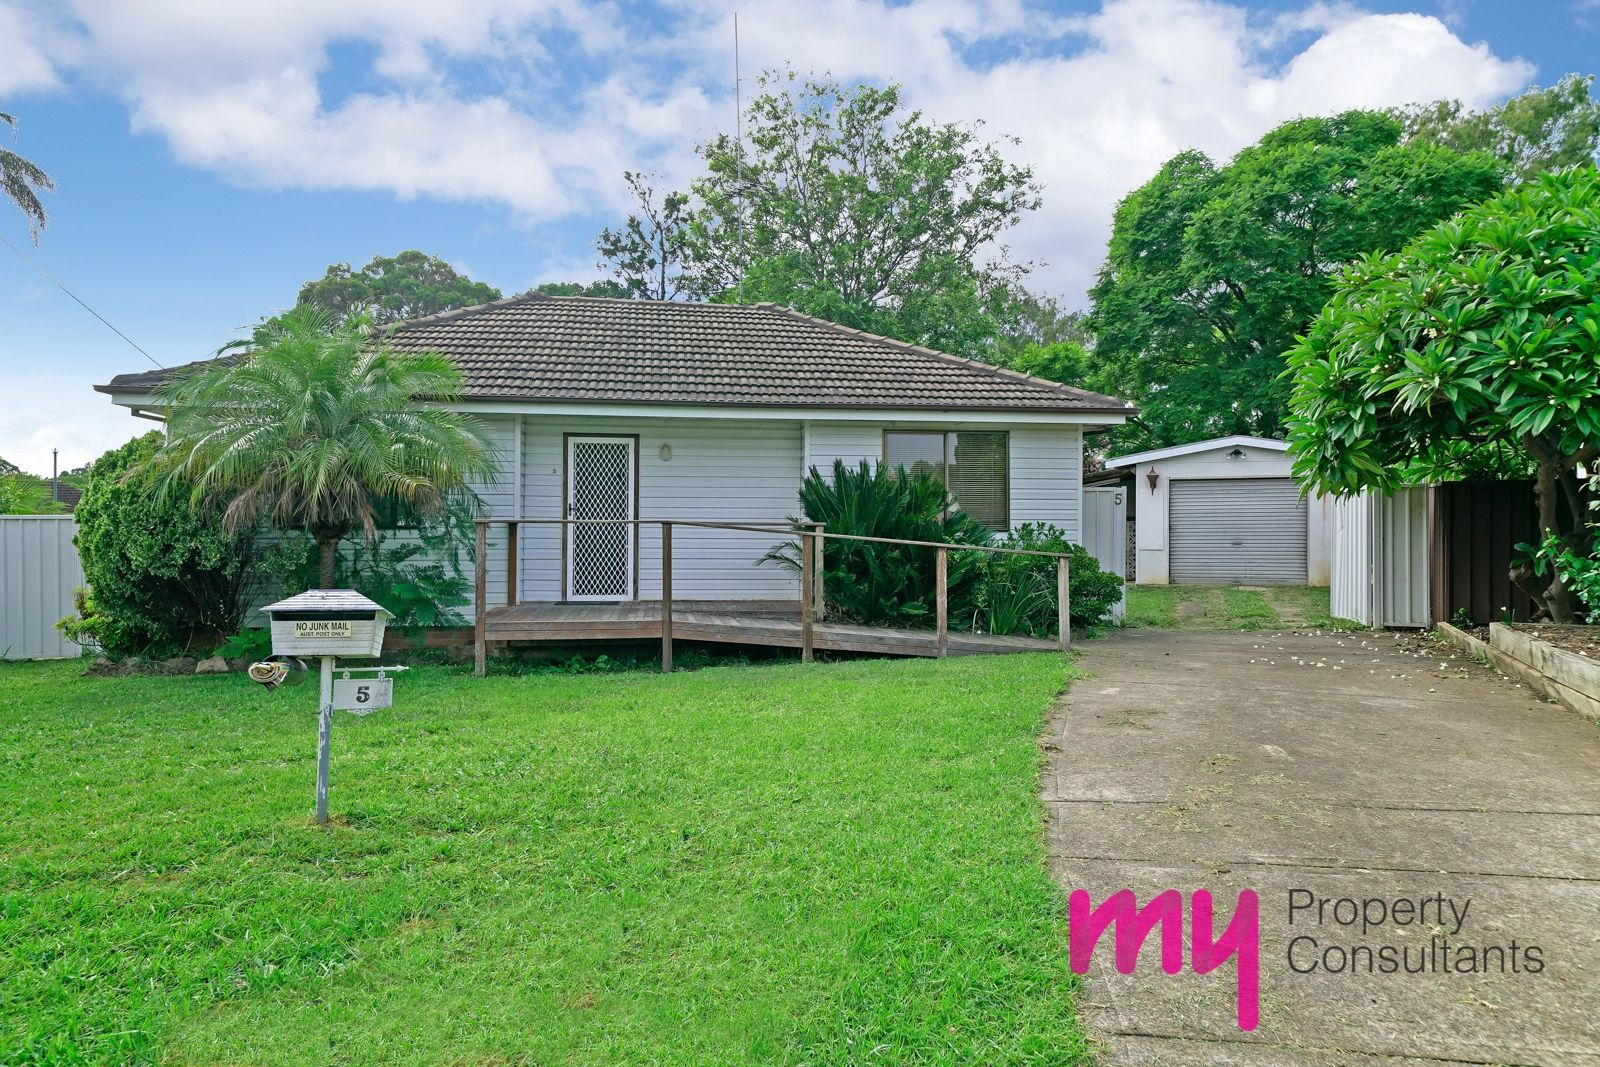 5 Seddon Place, Campbelltown NSW 2560, Image 0